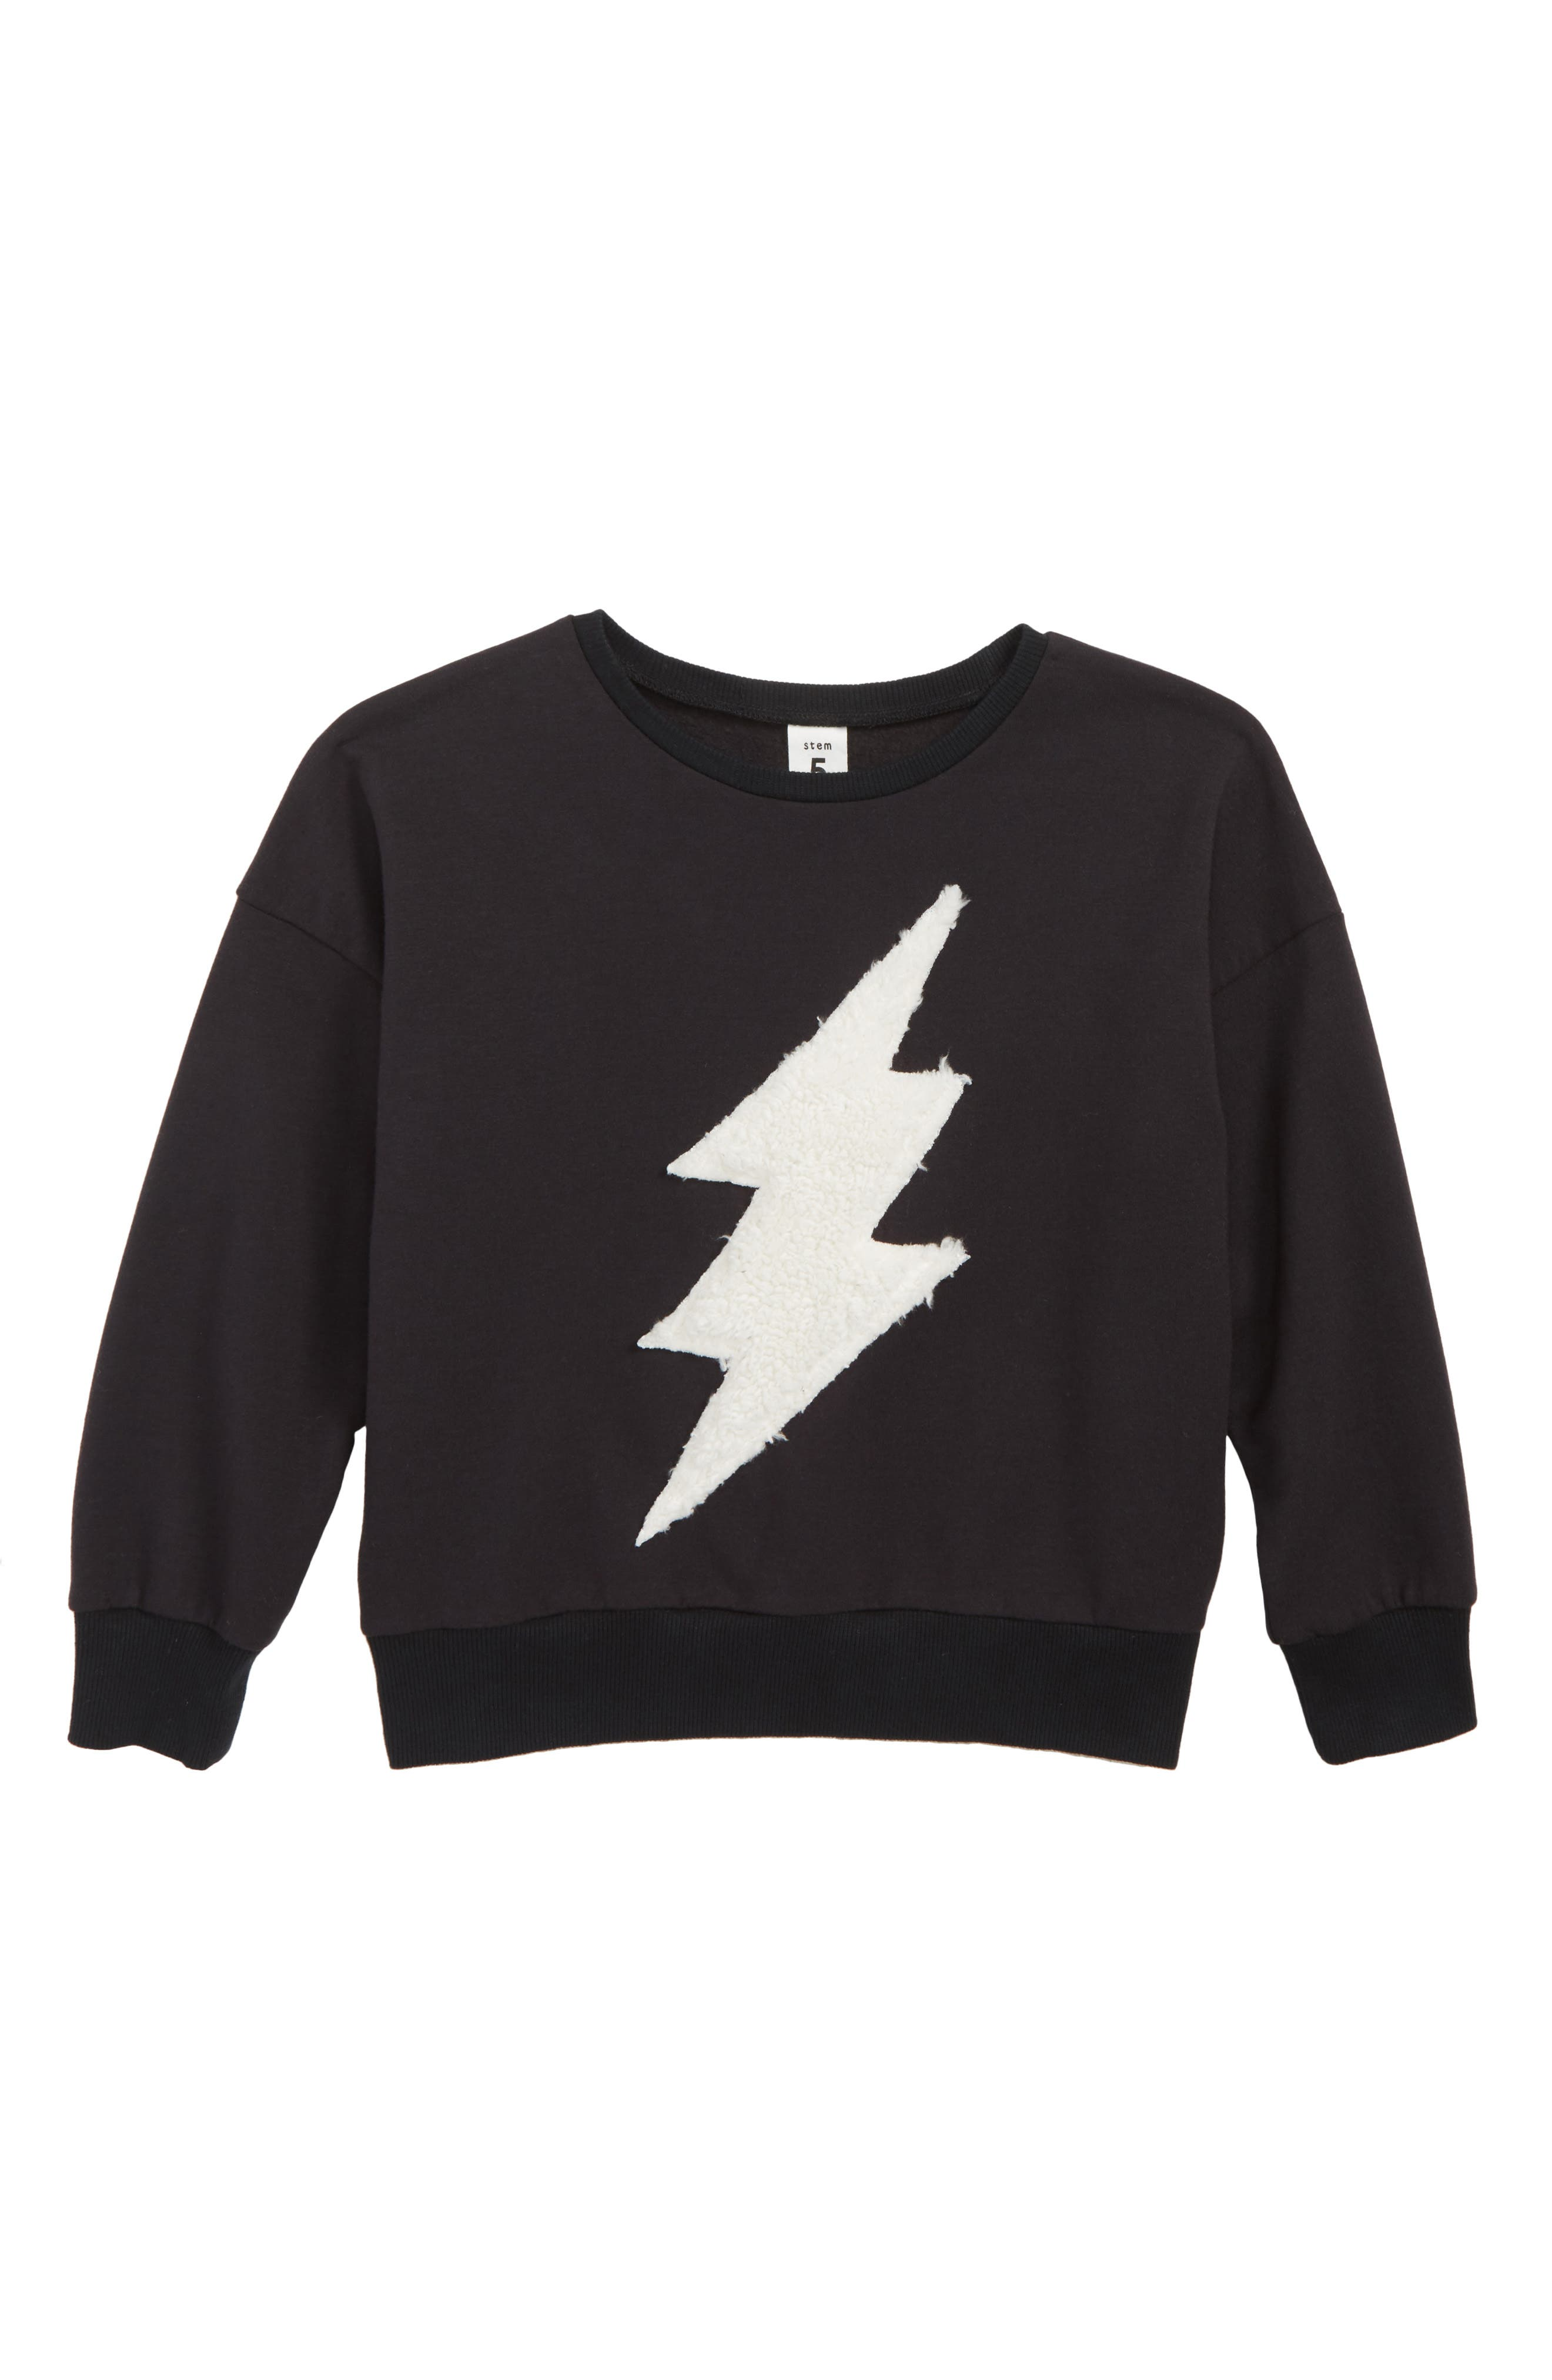 Lightning Appliqué Sweater,                             Main thumbnail 1, color,                             BLACK BOLD BOLT